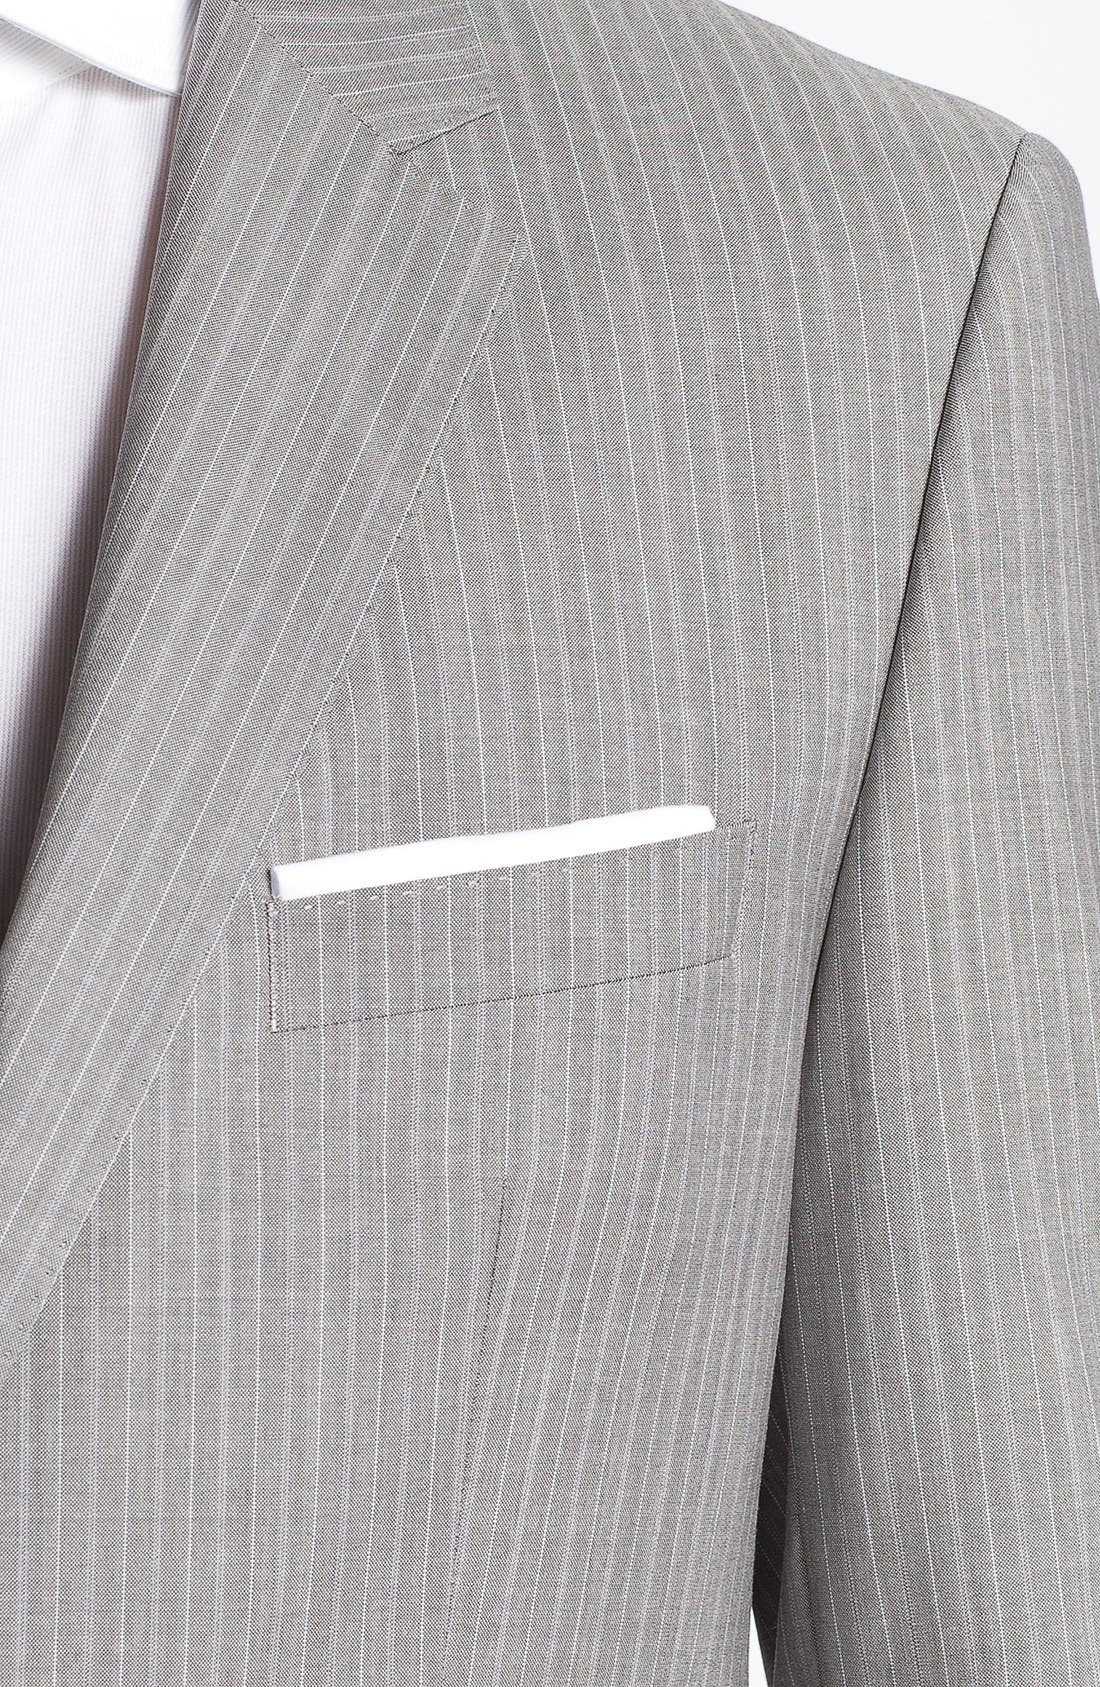 Alternate Image 2  - BOSS HUGO BOSS 'The Sweet/Sharp' Trim Fit Stripe Suit